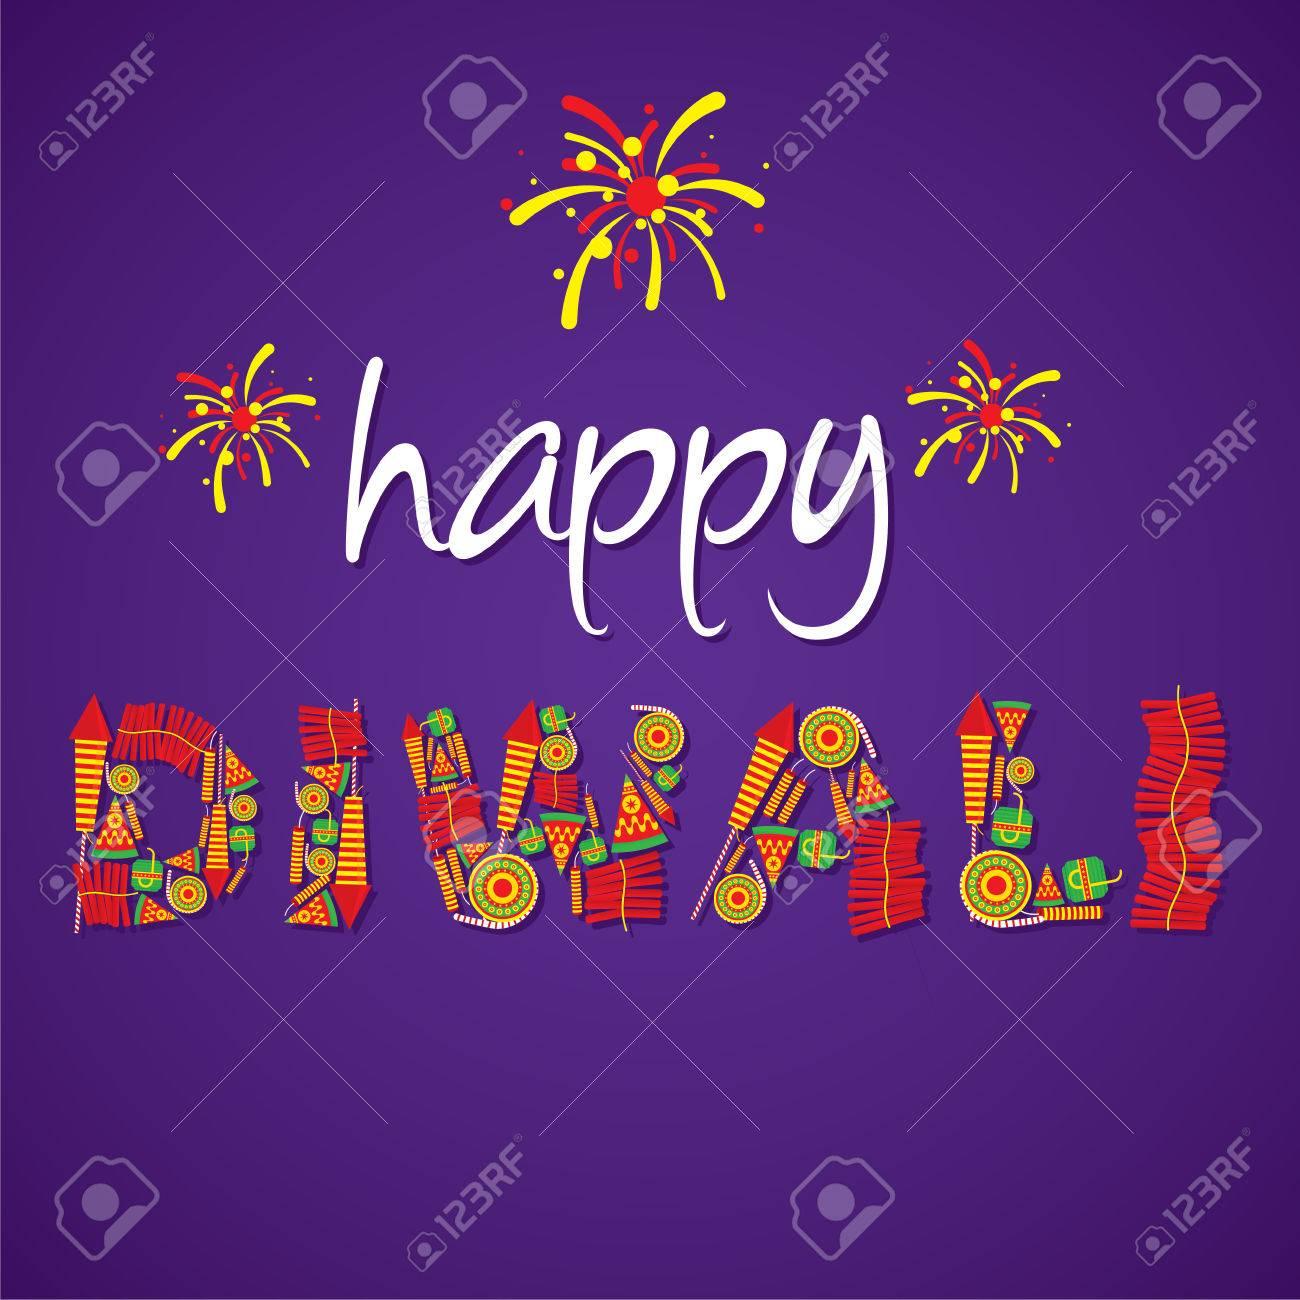 Creative happy diwali greeting design by cracker vector royalty creative happy diwali greeting design by cracker vector stock vector 47040274 kristyandbryce Gallery